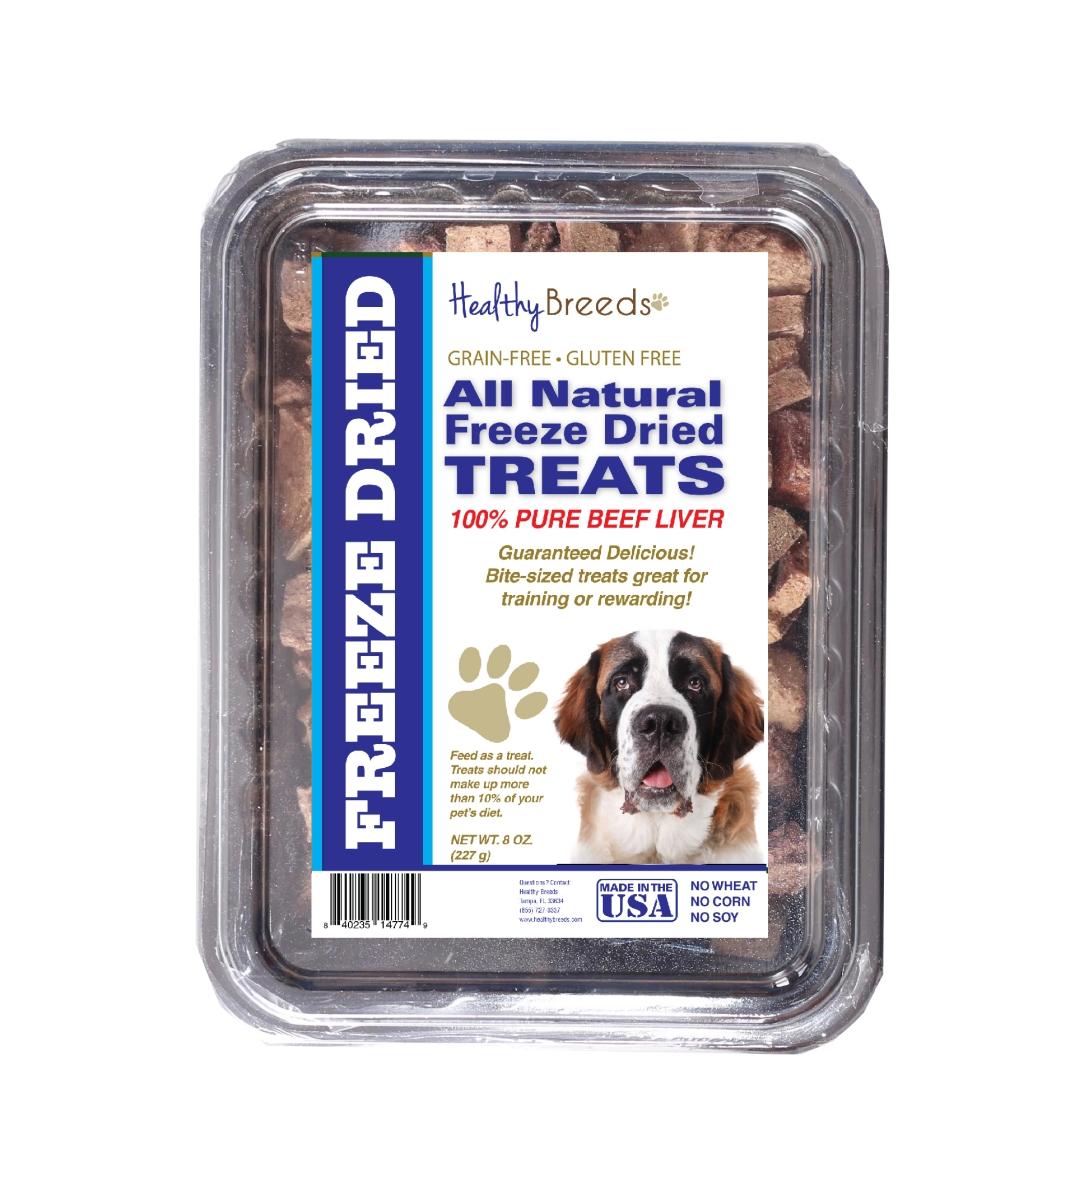 Healthy Breeds 840235148173 10 oz Saint Bernard All Natural Freeze Dried Treats Beef Liver